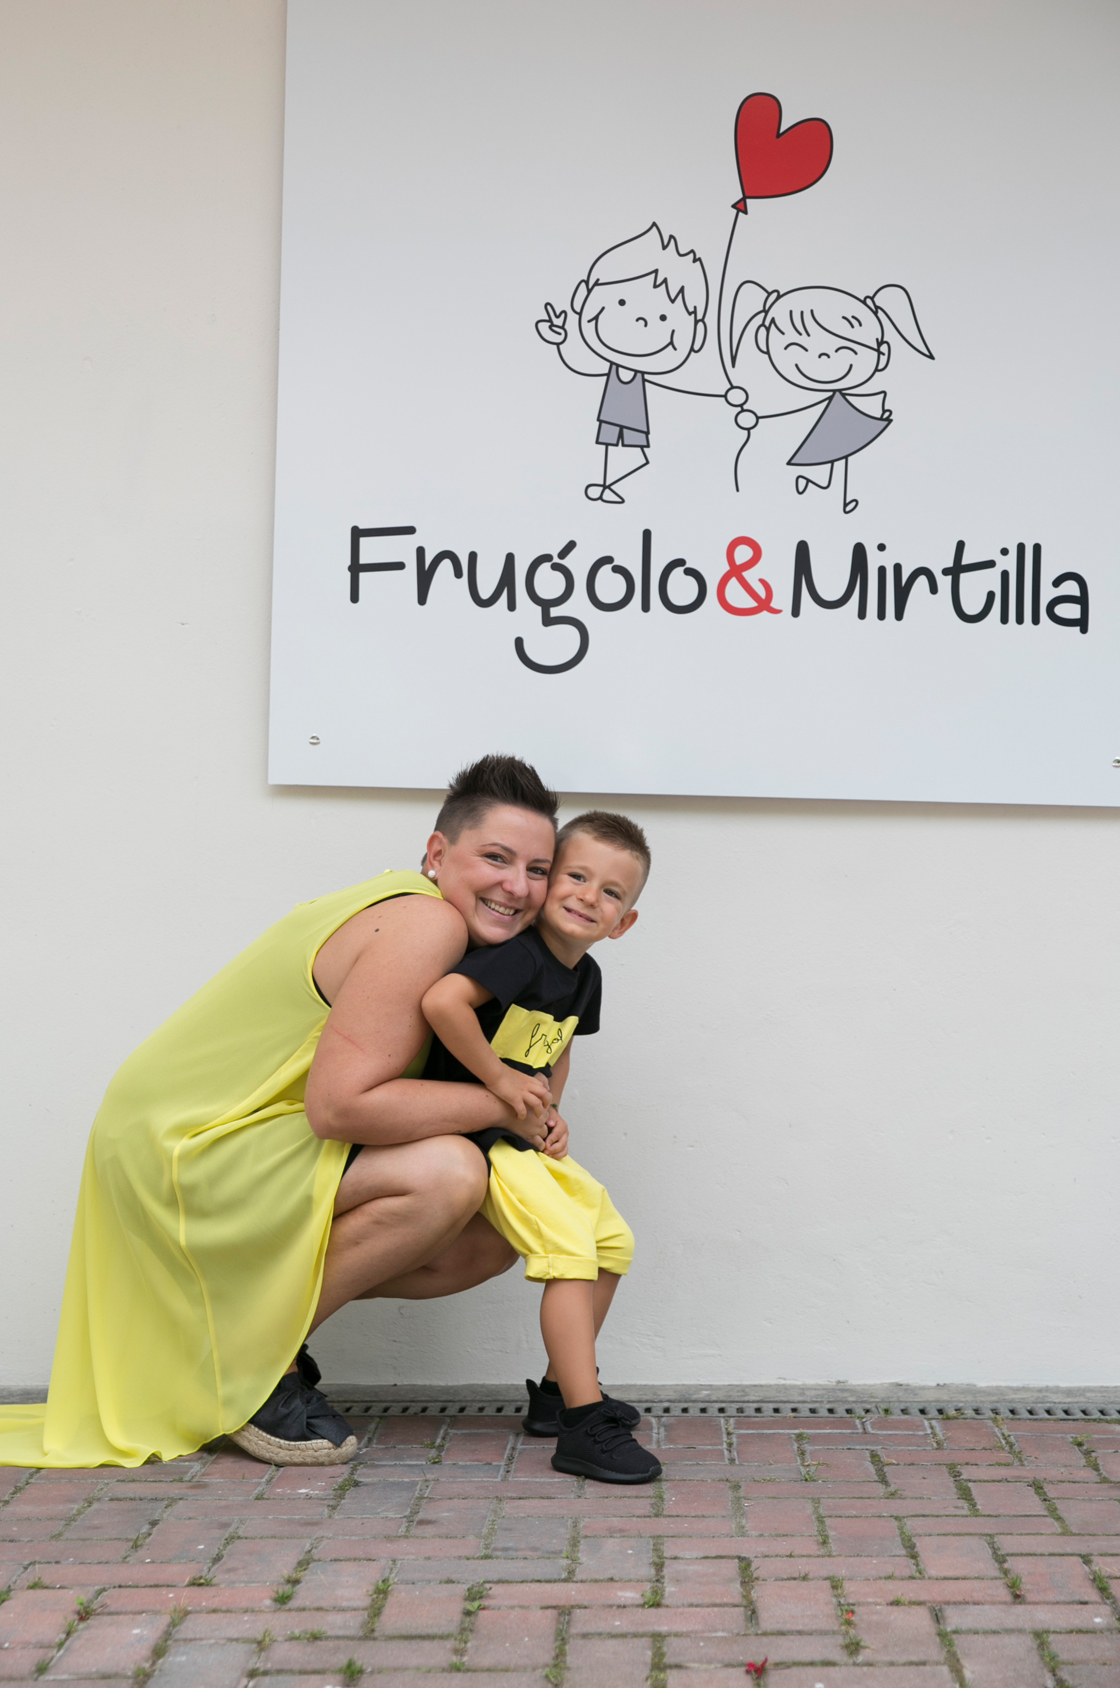 Paola Gazzoli